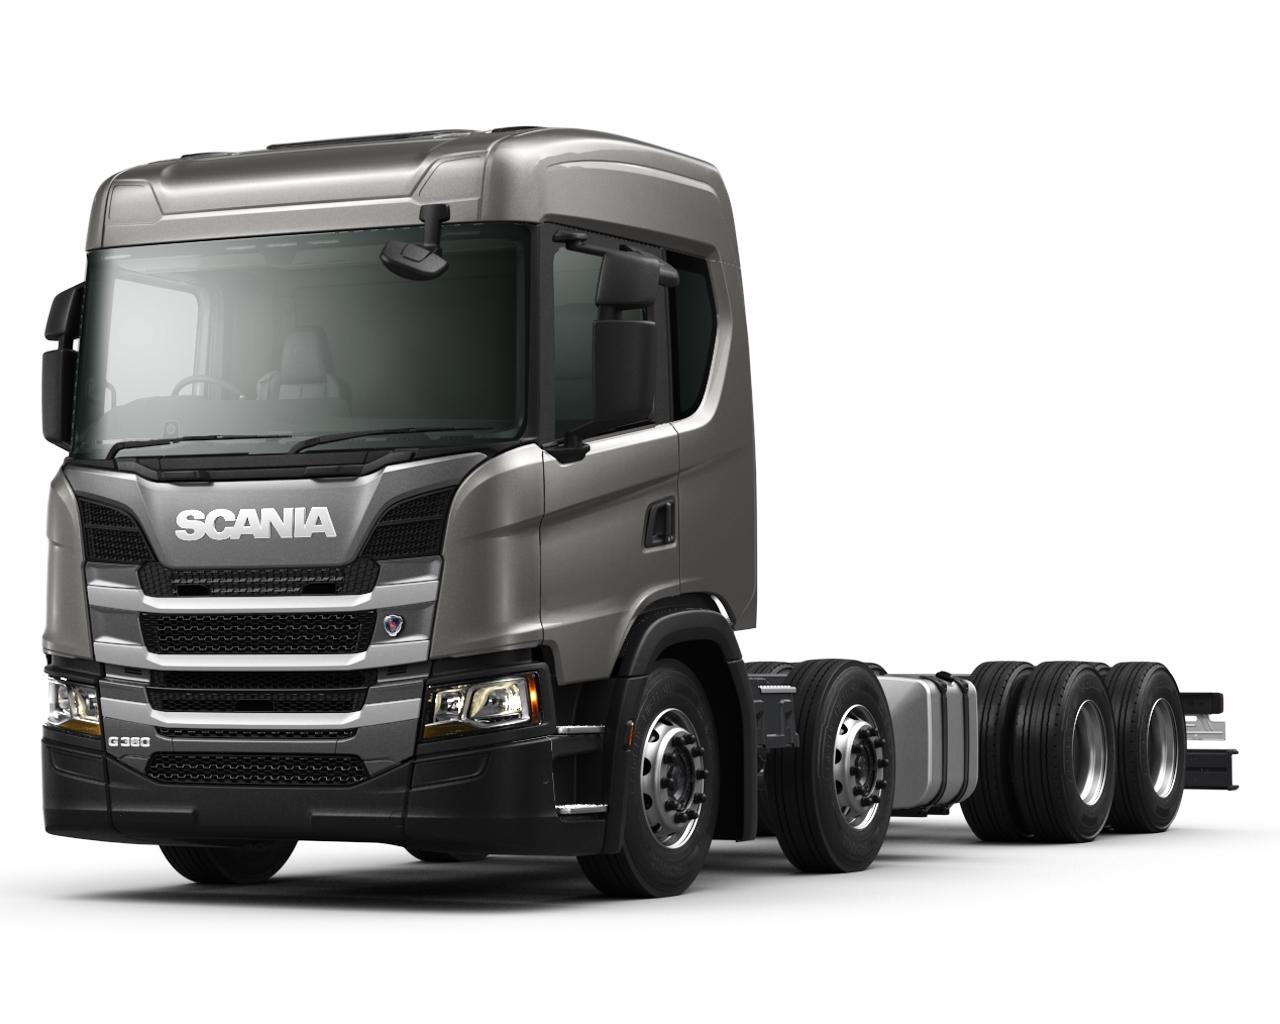 Scania G 360 B8x4NA Tipper Truck